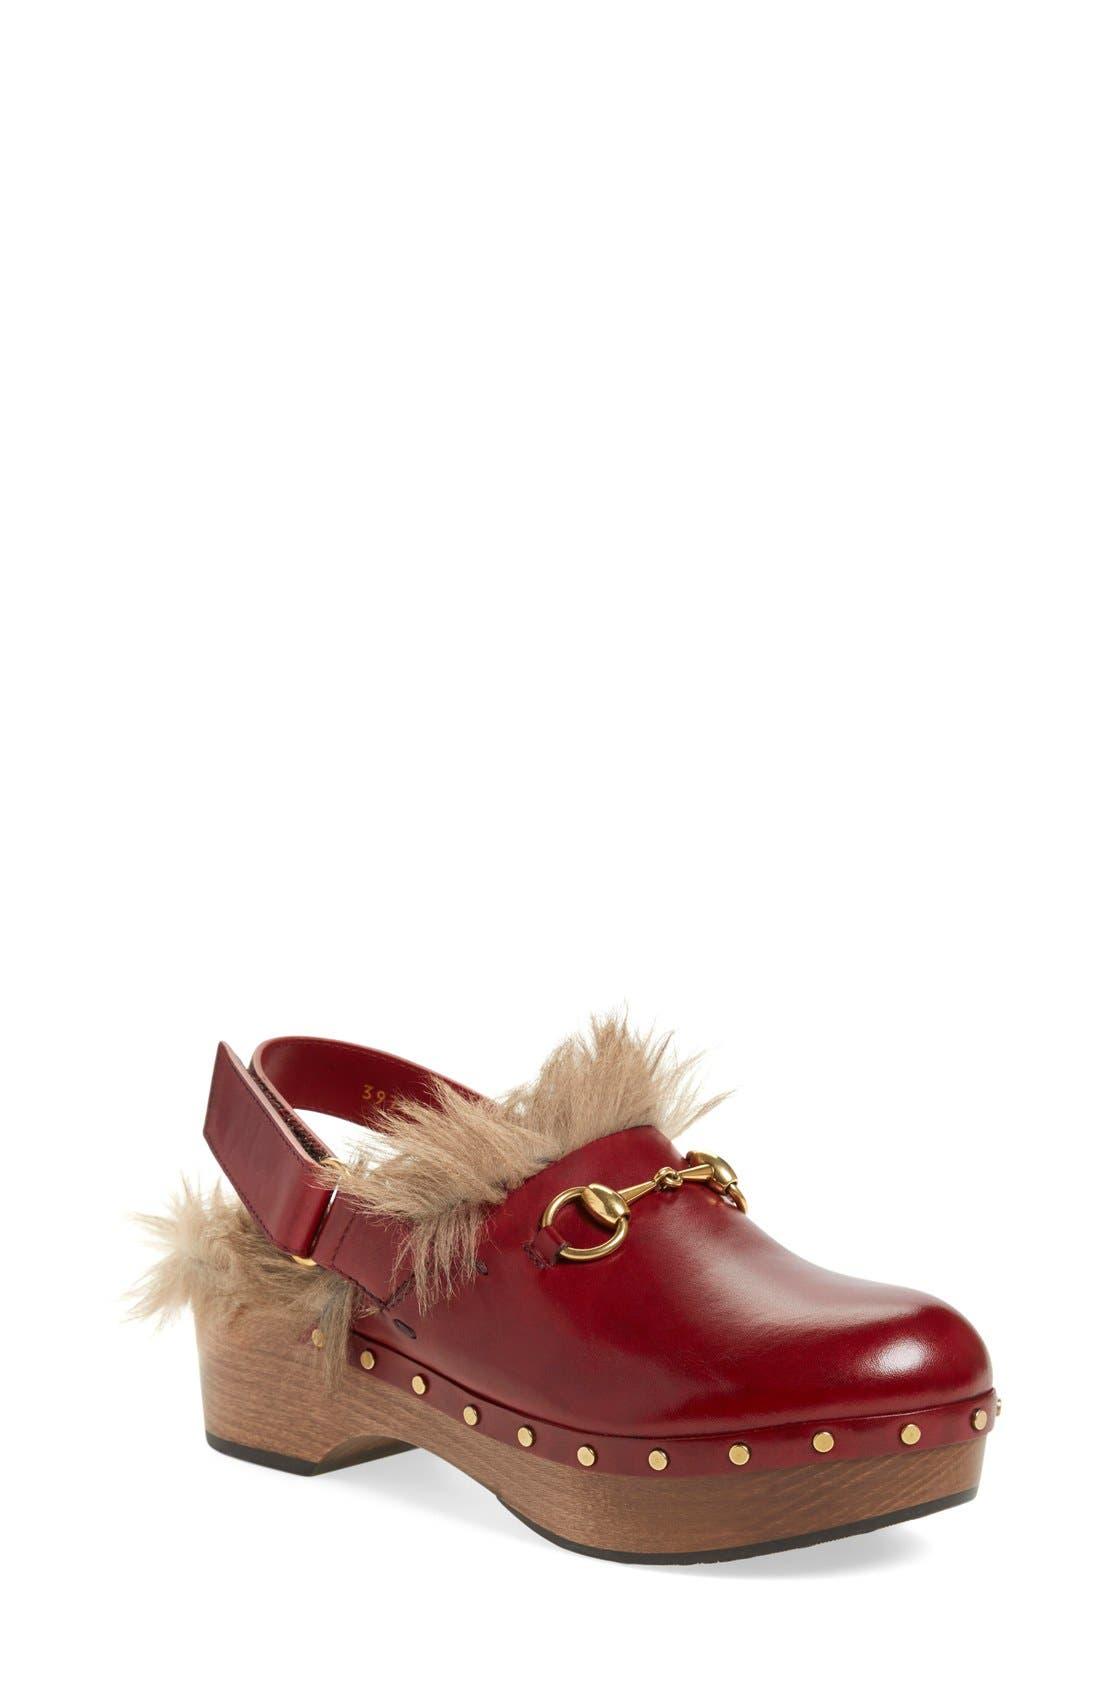 'Amstel' Genuine Kangaroo Fur Clog,                             Main thumbnail 1, color,                             Burgundy/ Red